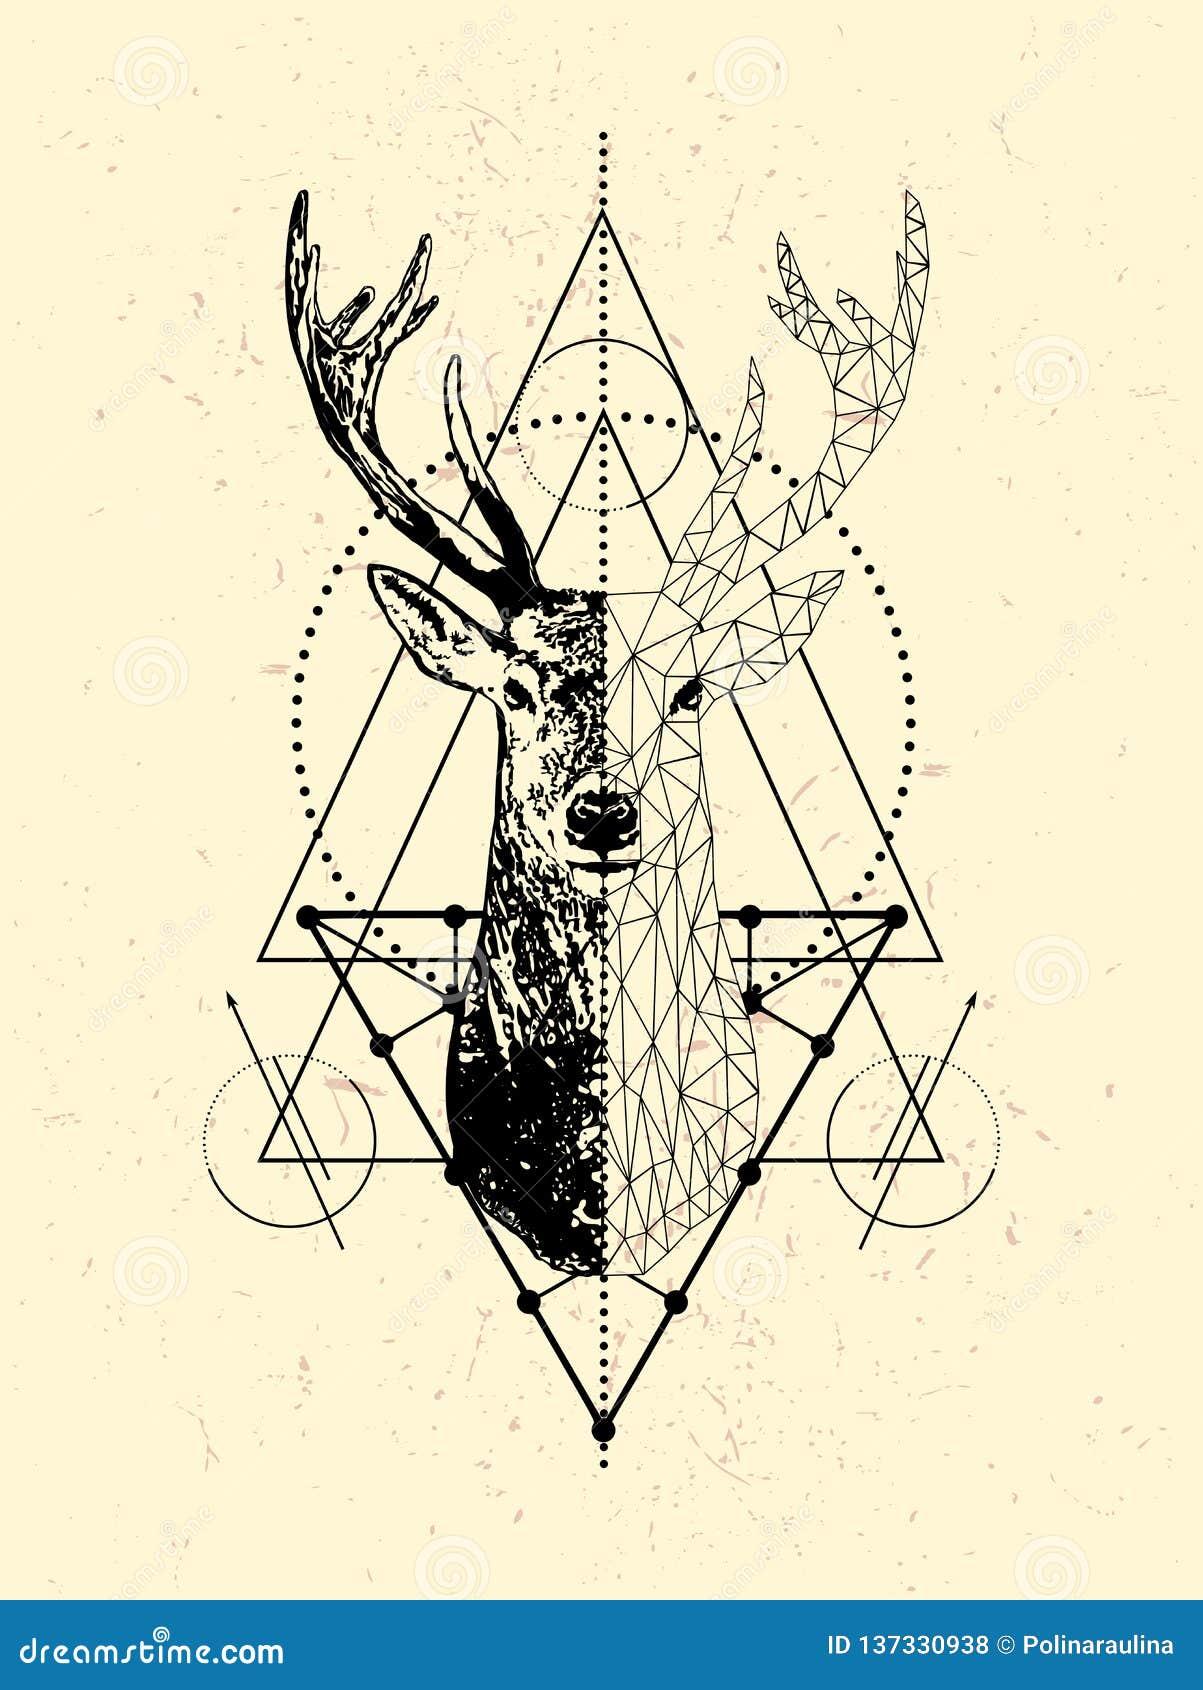 Poligonal deer poster design.Low poly deer head with triangle.